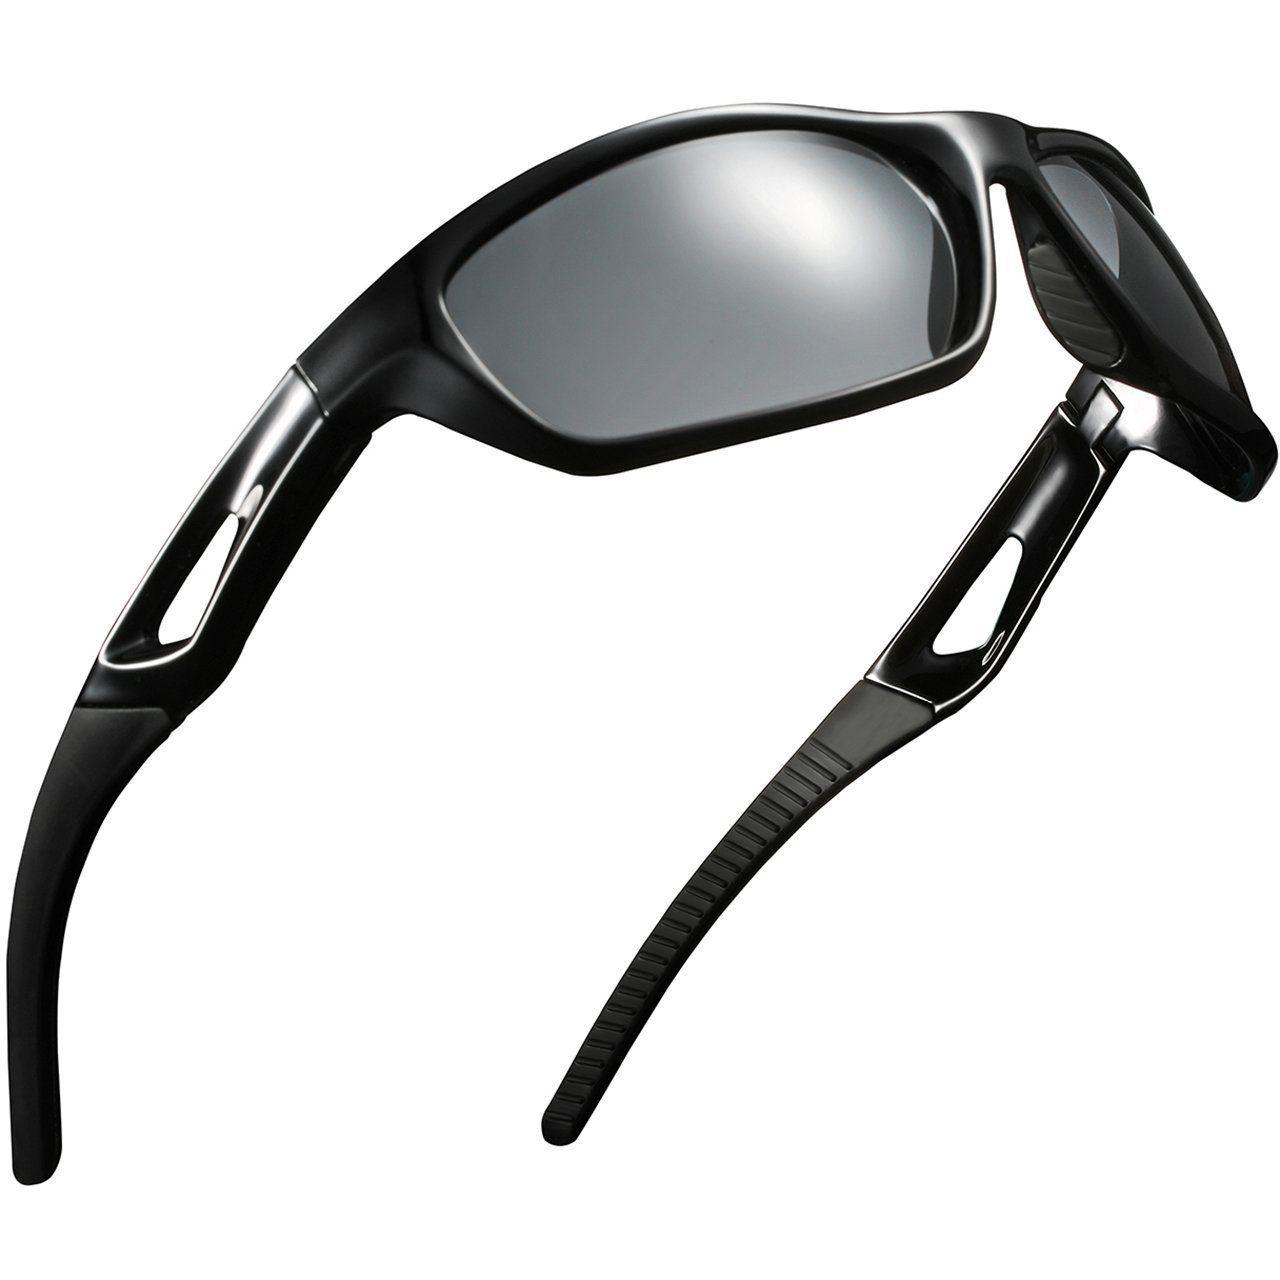 3399d40e1b Aluminum Magnesium Polarized Sunglasses Riding Glasses Mens Outdoor Sports  Glasses Polarized Sunglasses Riding Glasses Outdoor Sports Online with ...